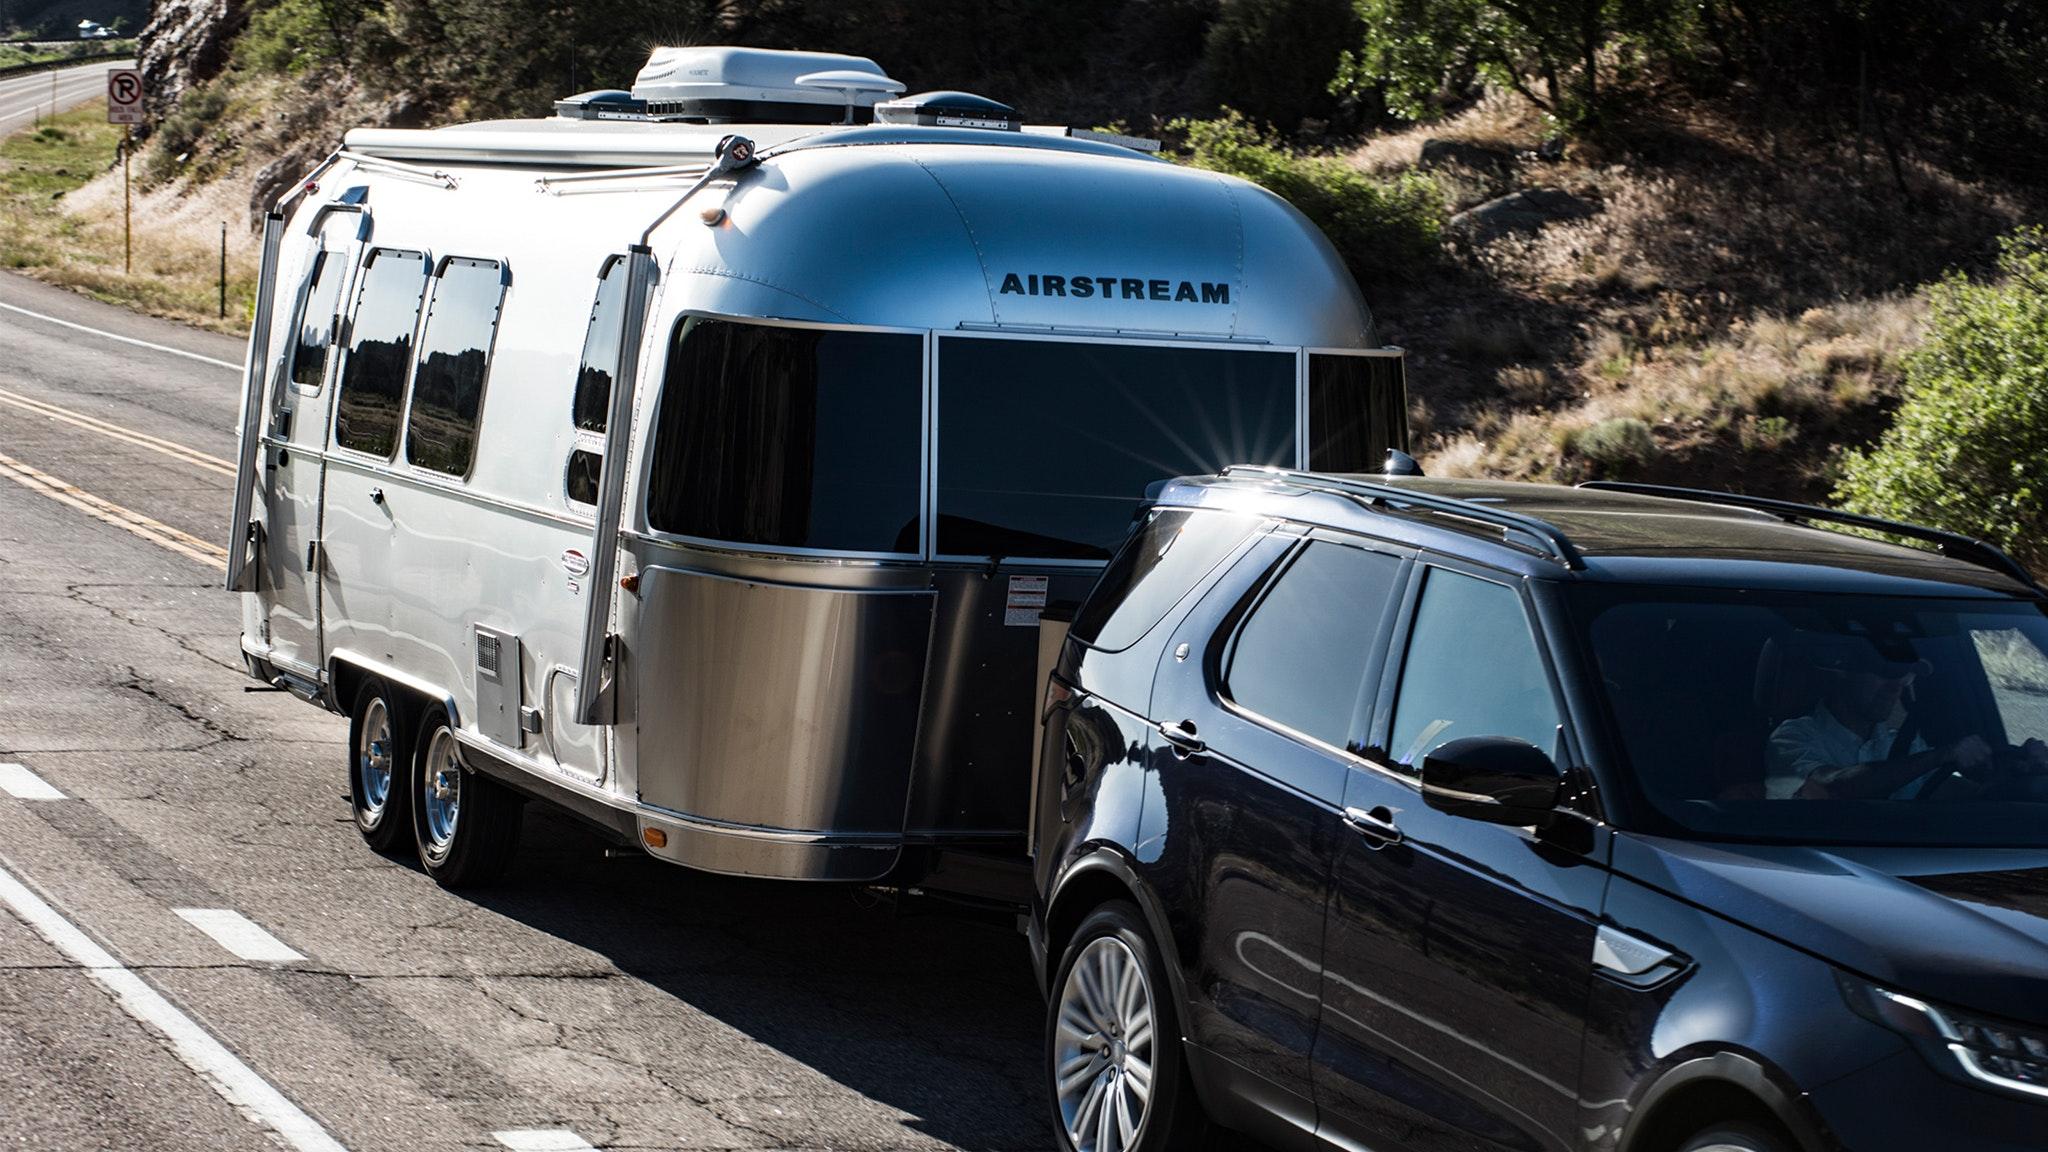 Airstream-Double-Axle-vs-Single-Axle-Blog-Desktop-Feature